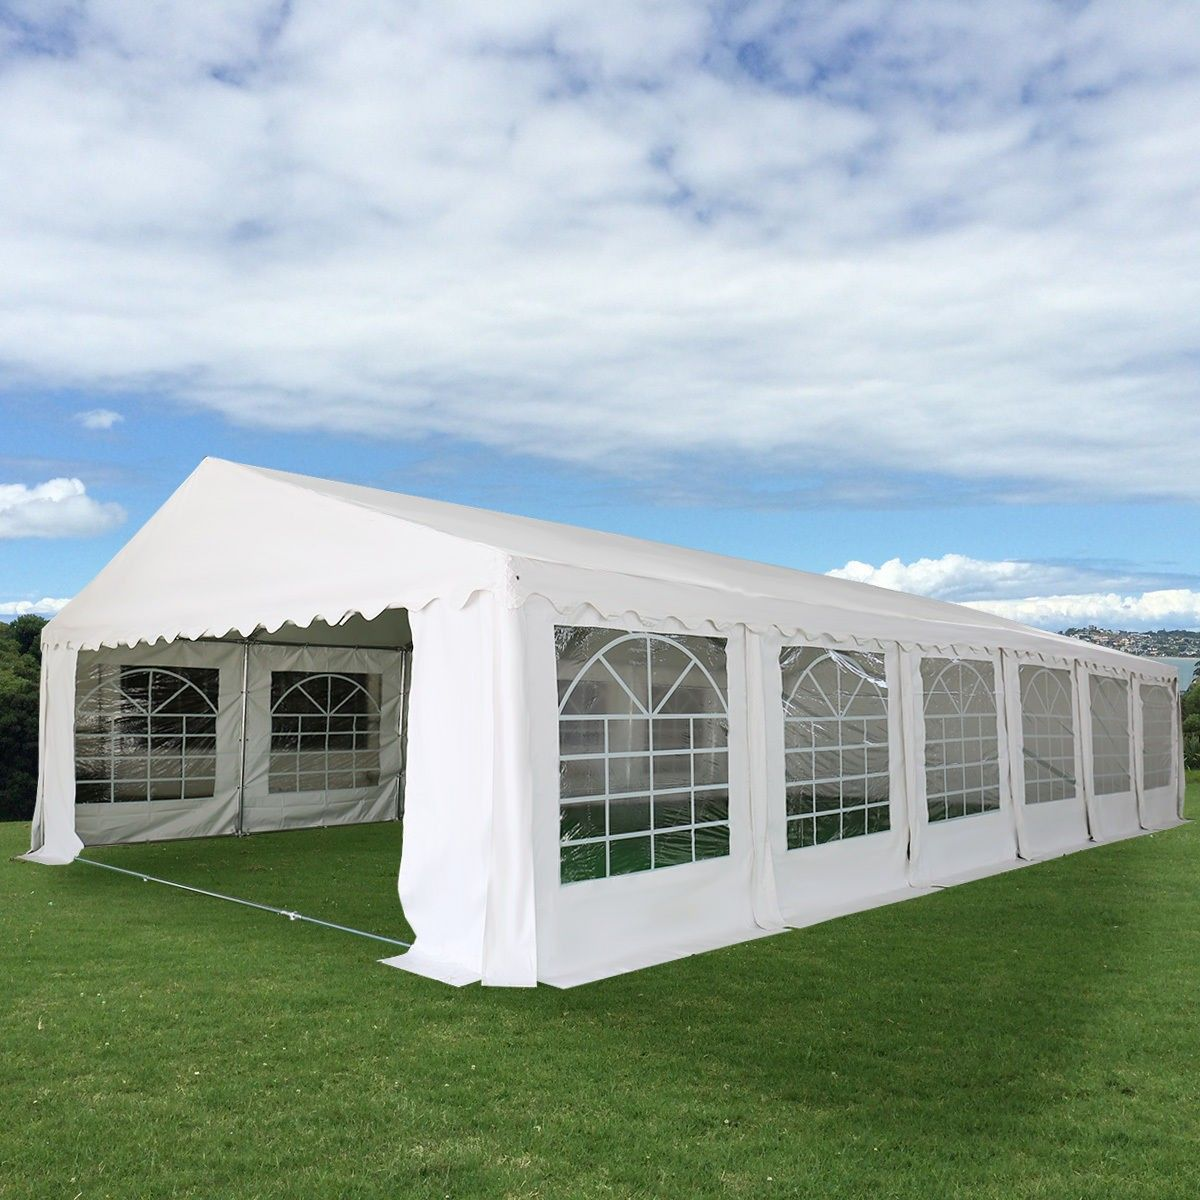 20u0027 x 40u0027 Shelter Heavy Duty #Outdoor Wedding Tent & 20u0027 x 40u0027 Shelter Heavy Duty #Outdoor Wedding Tent | Home u0026 Garden ...